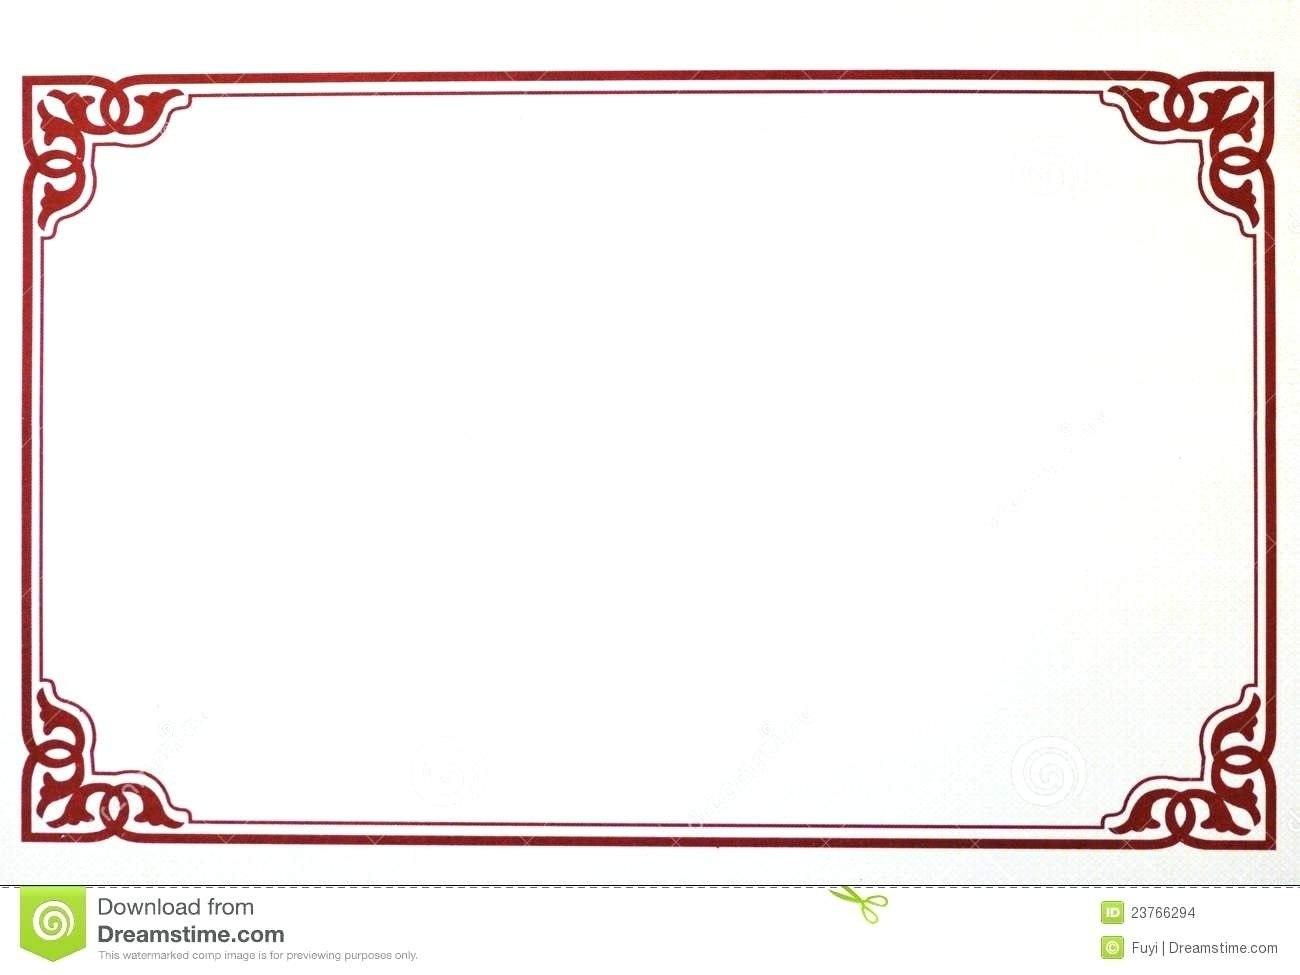 Border Design Templates  Vectorborders Intended For Certificate Border Design Templates